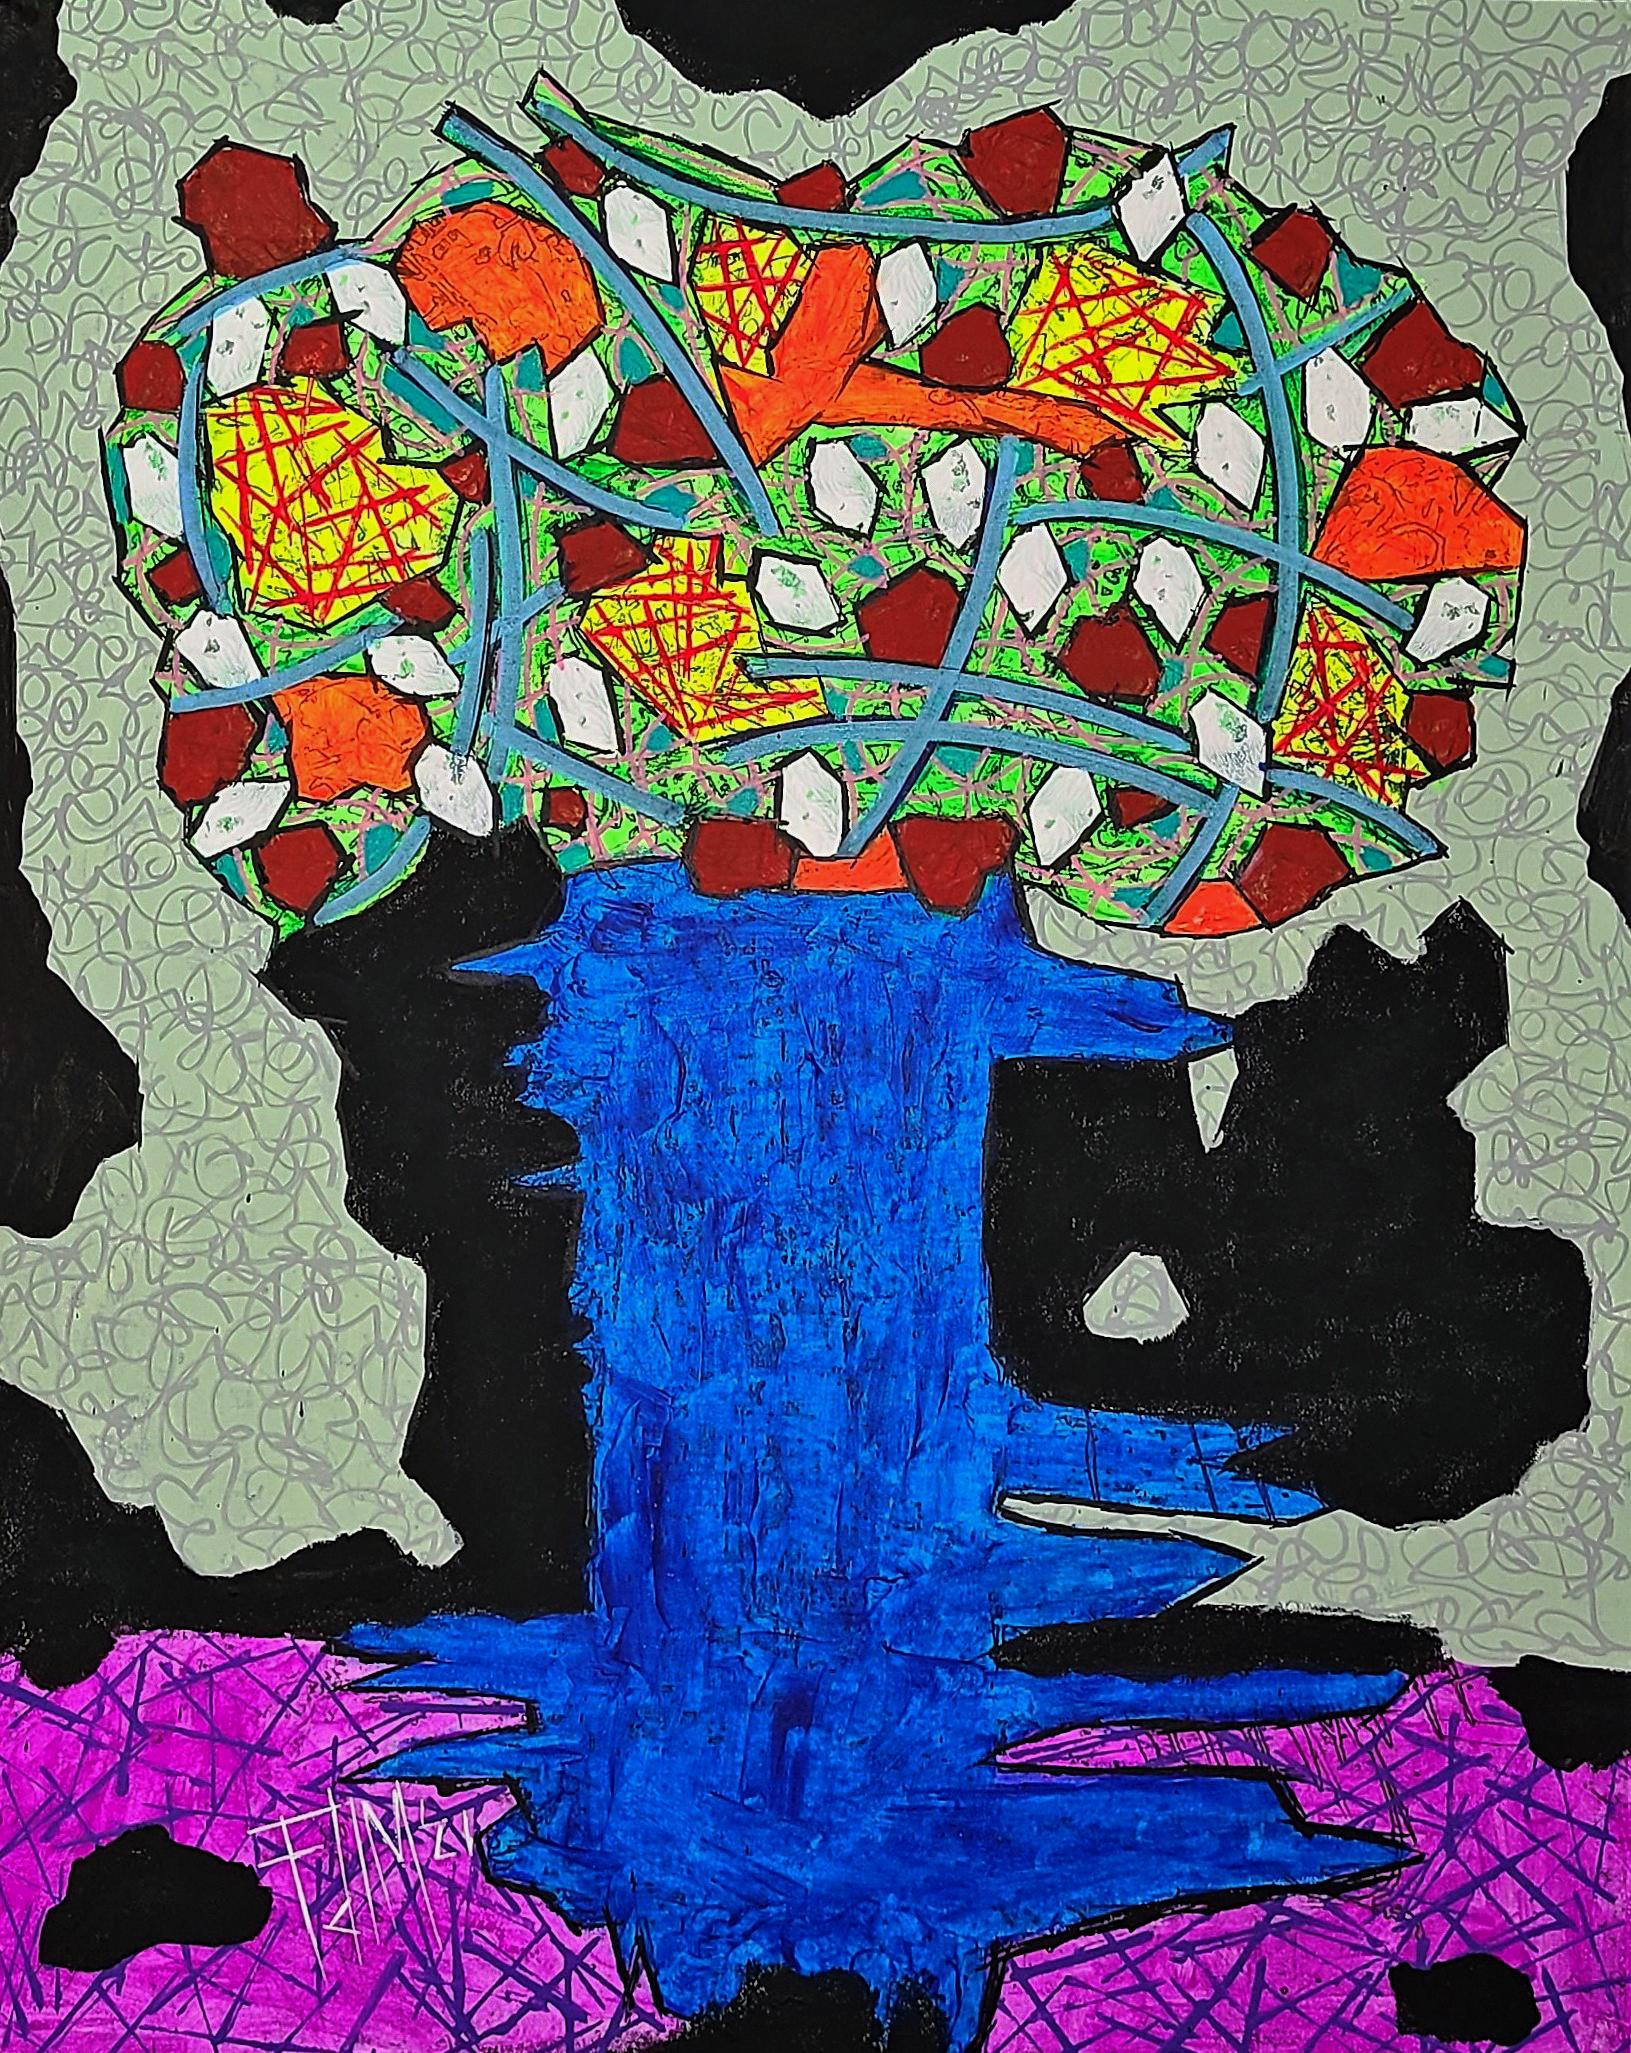 Azul artwork by Franck de las Mercedes - art listed for sale on Artplode